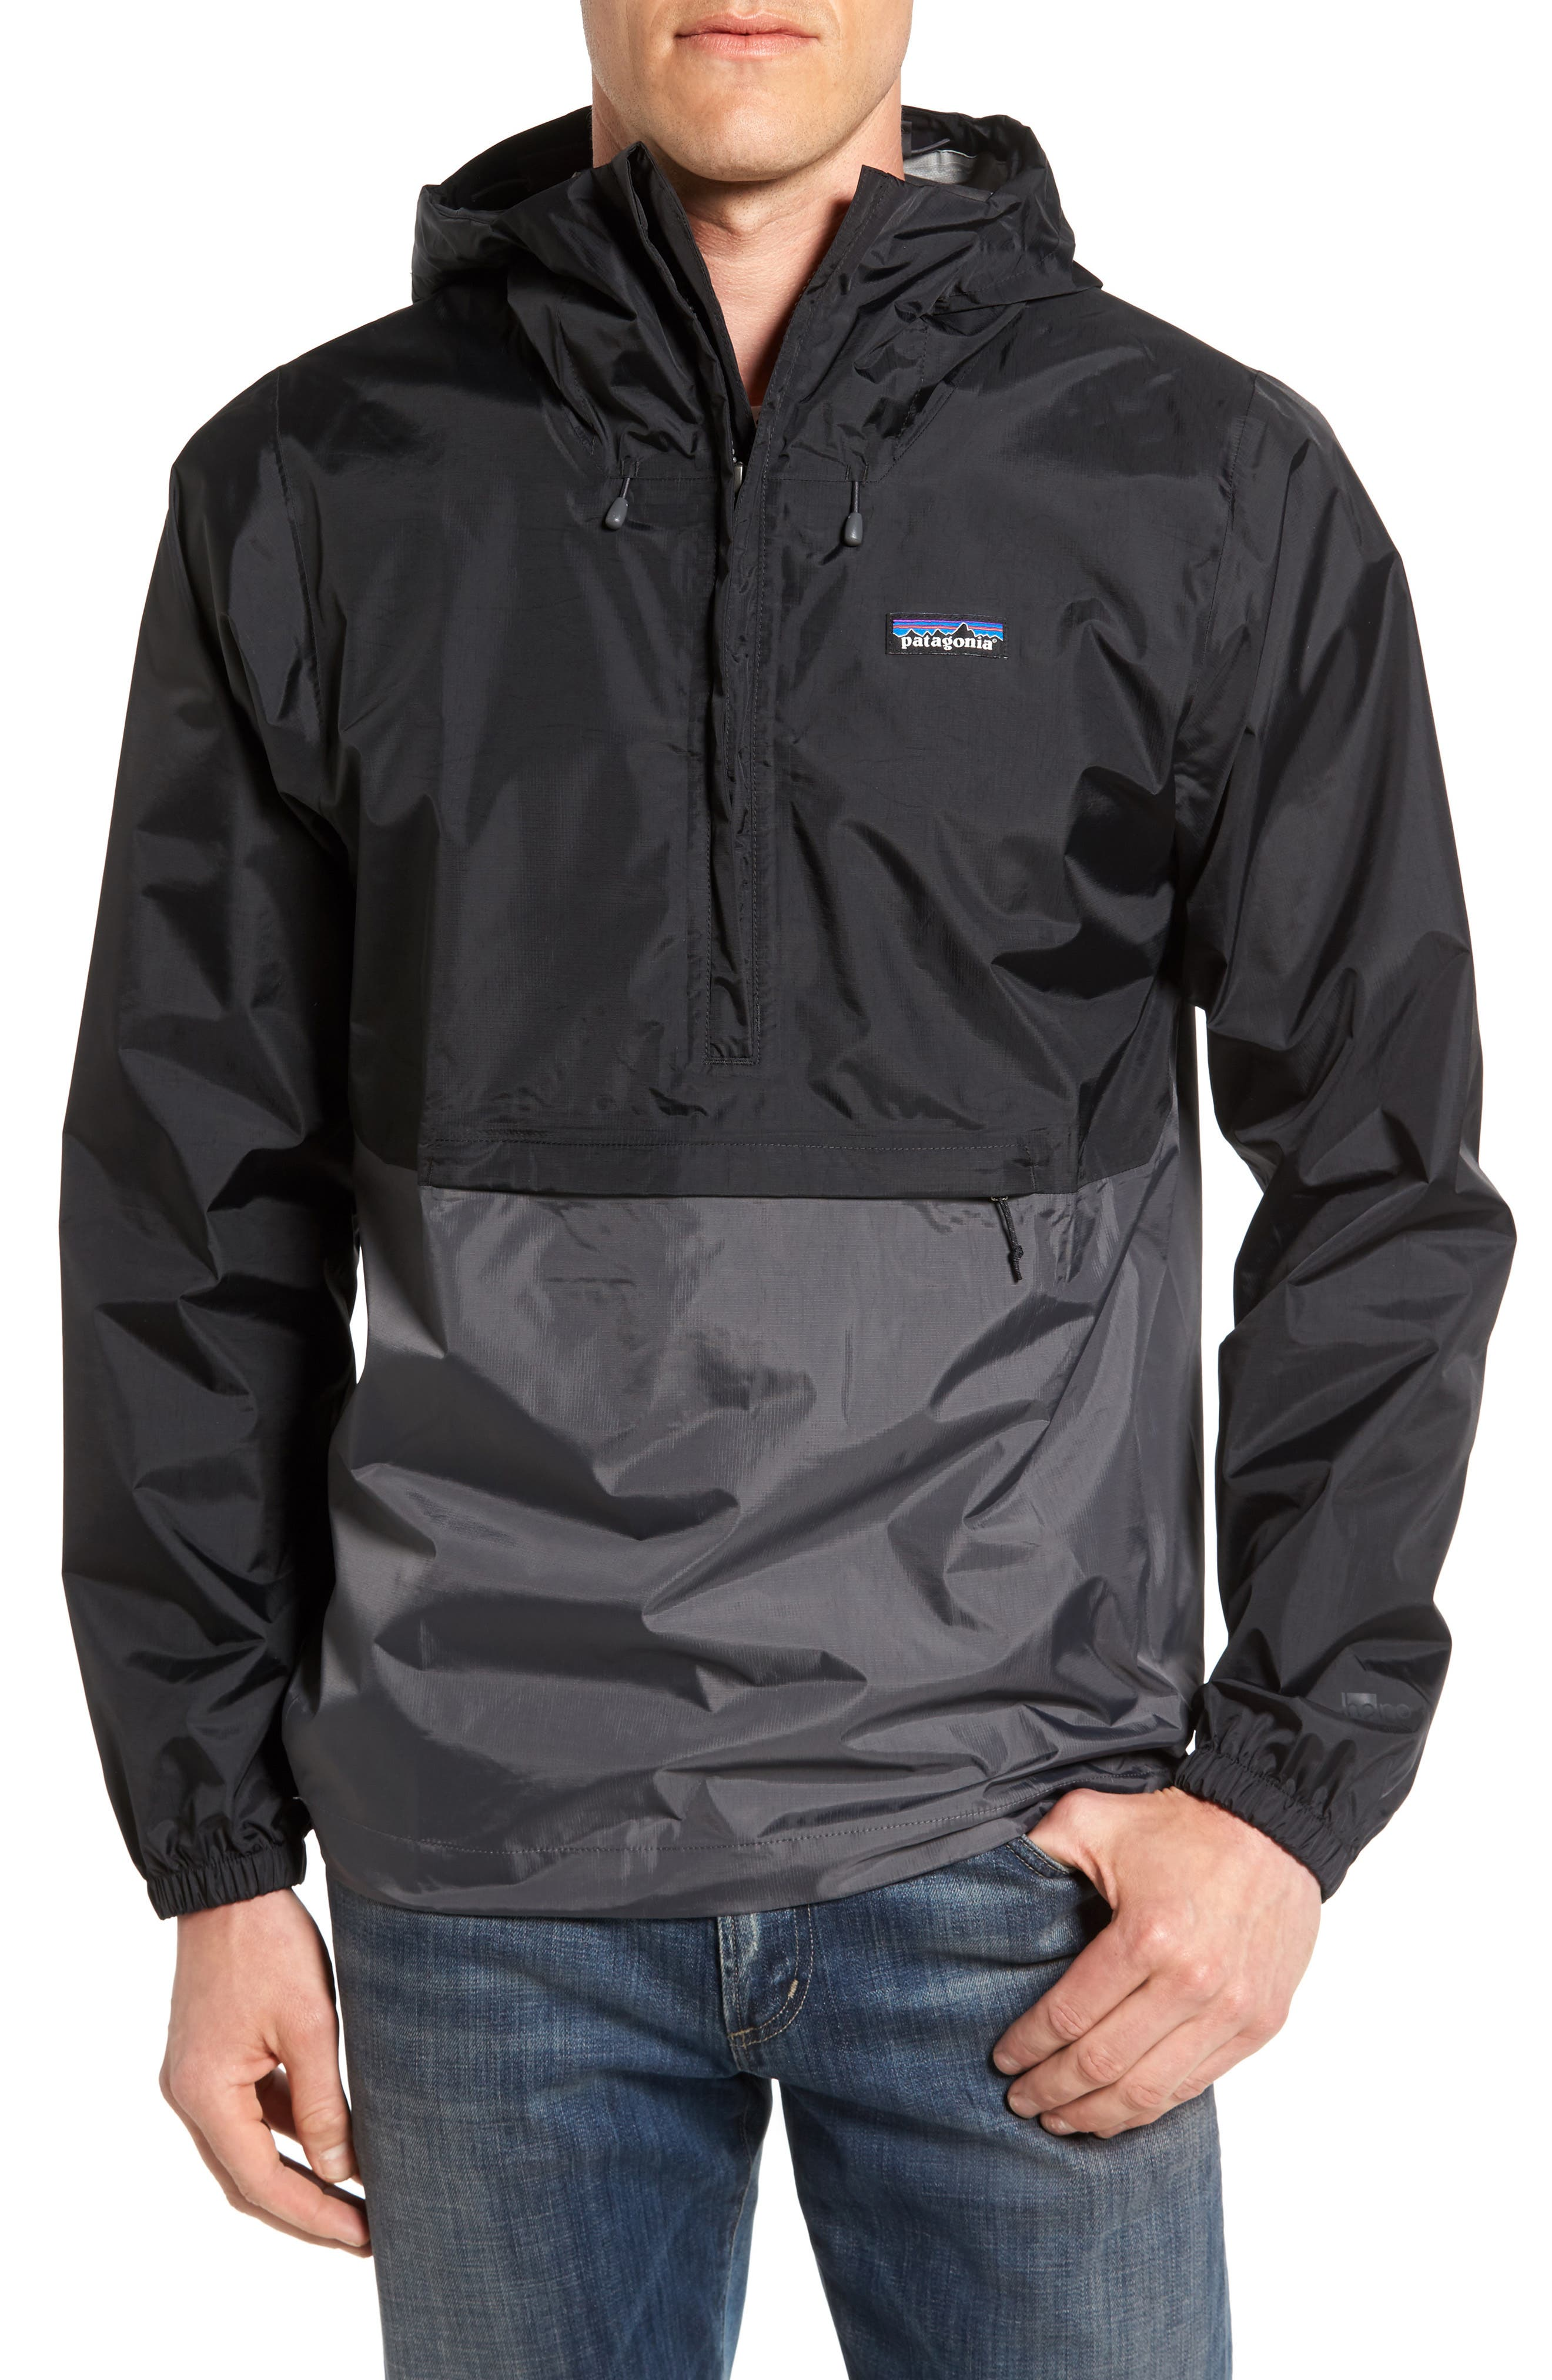 Main Image - Patagonia Torrentshell Packable Regular Fit Rain Jacket